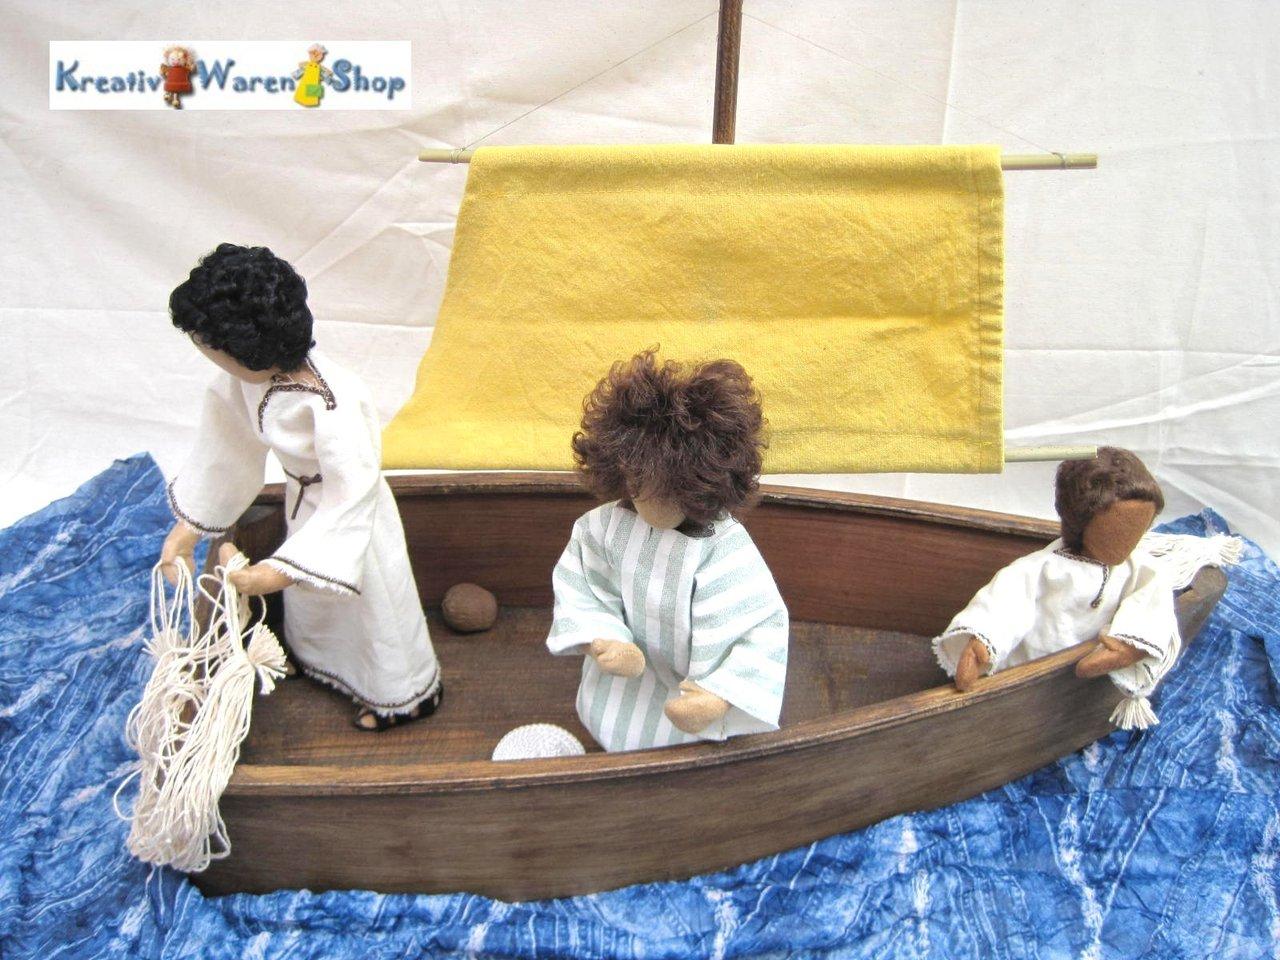 biblische erz hlfiguren kaufen fischerboot mit besatzung. Black Bedroom Furniture Sets. Home Design Ideas